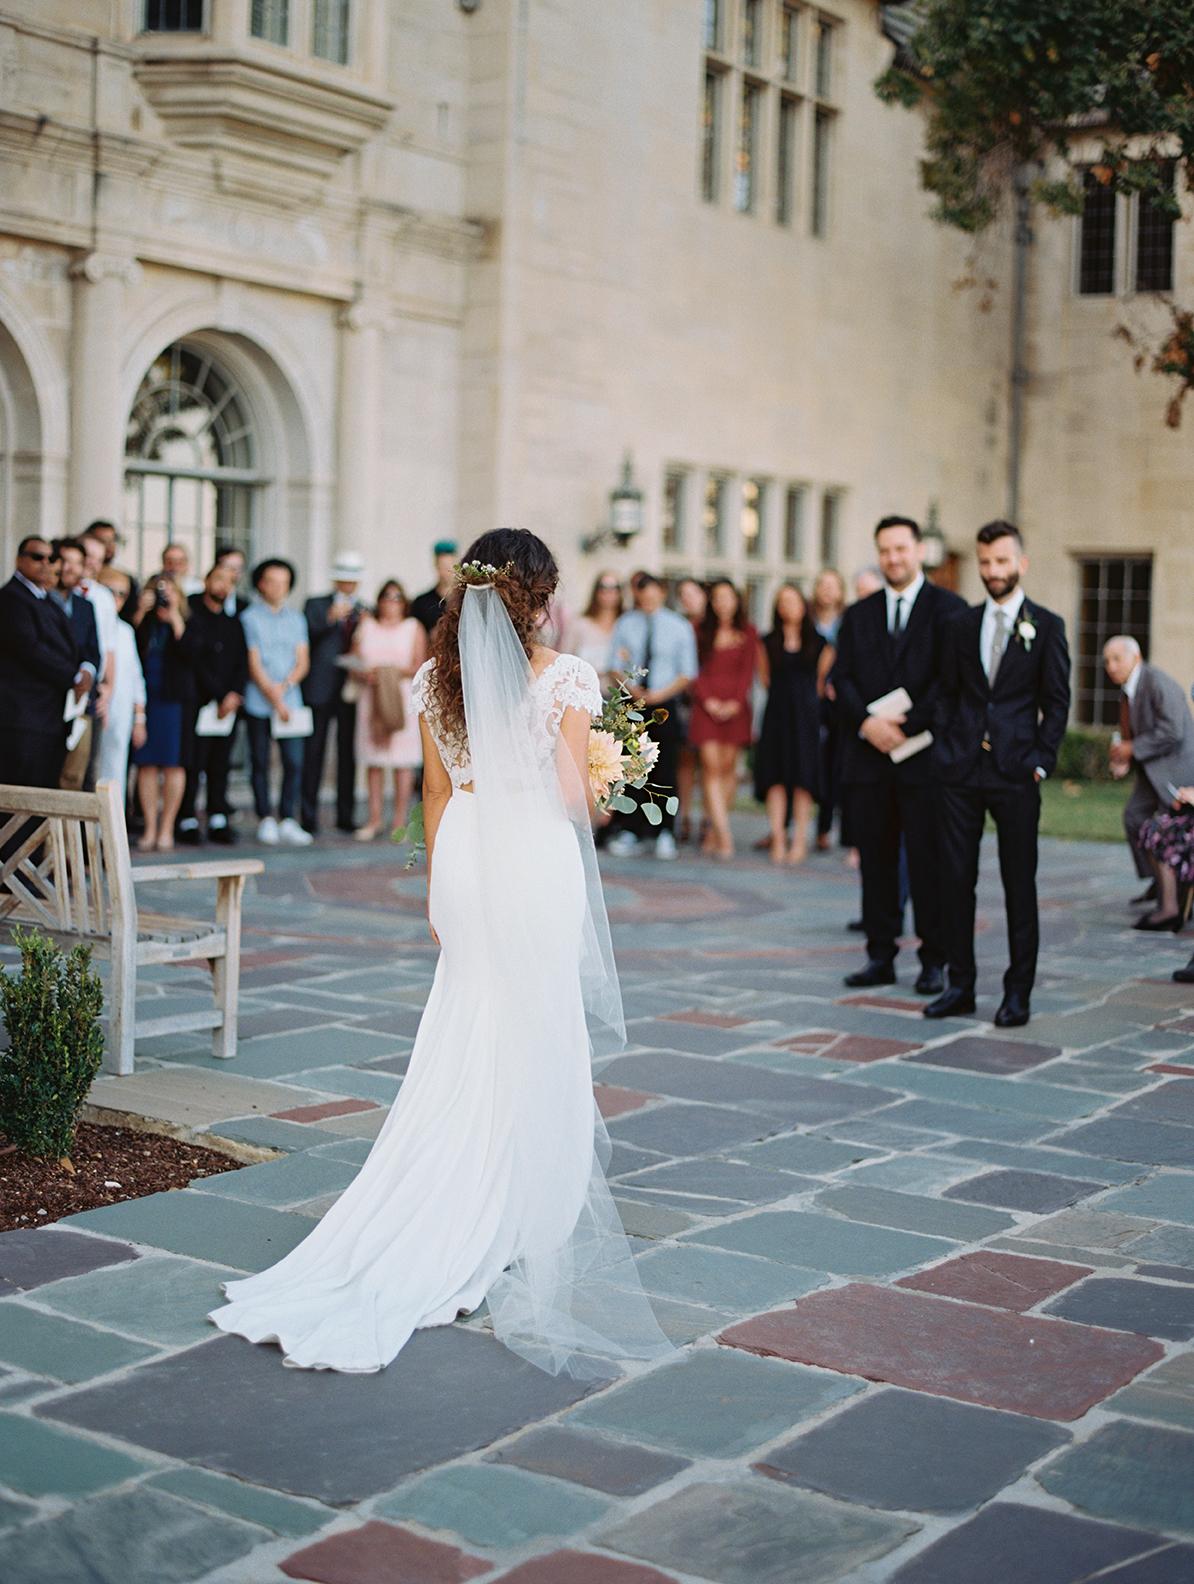 181-brian-sarra-los-angeles-wedding-brumley-wells-photography.jpg